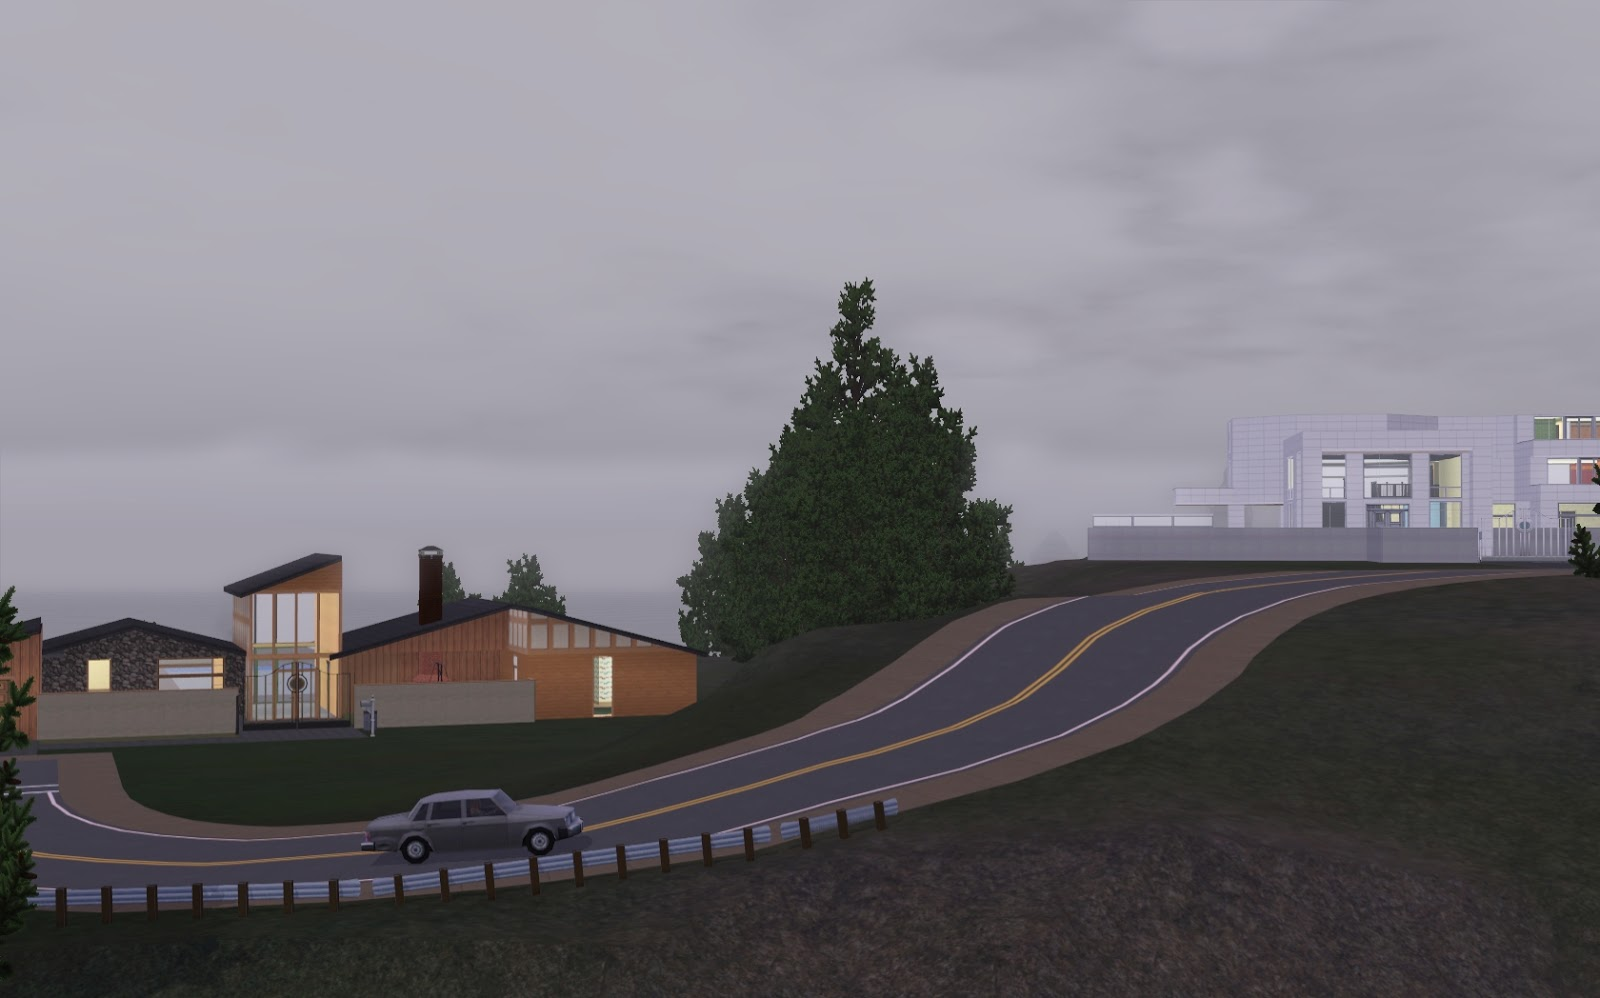 Bridgeport The Sims 3